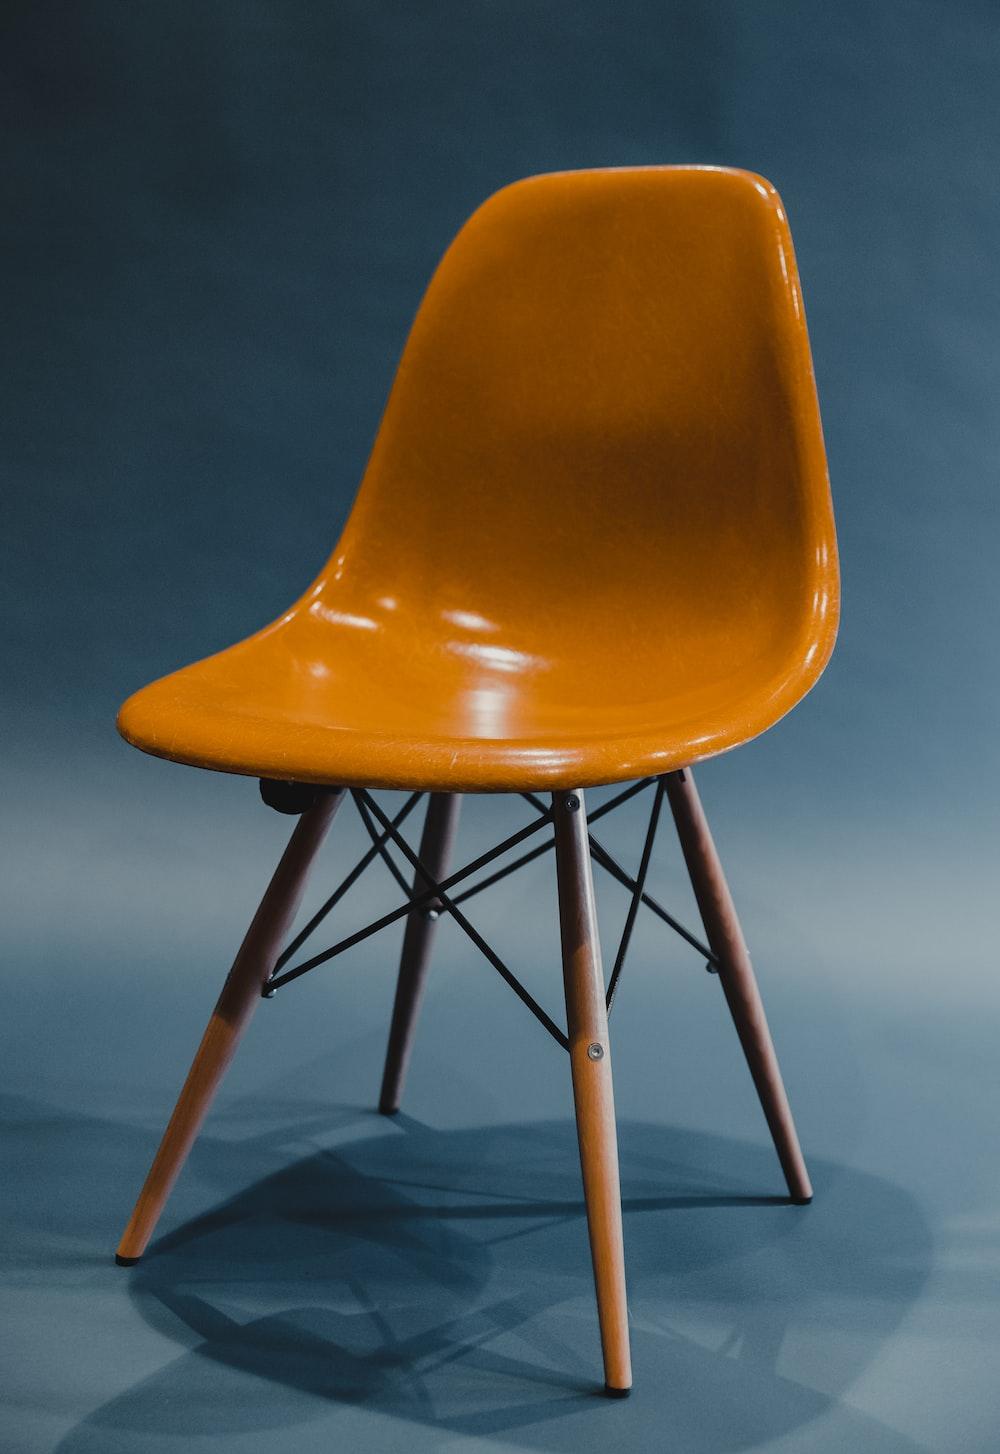 orange and black chair on brown wooden floor